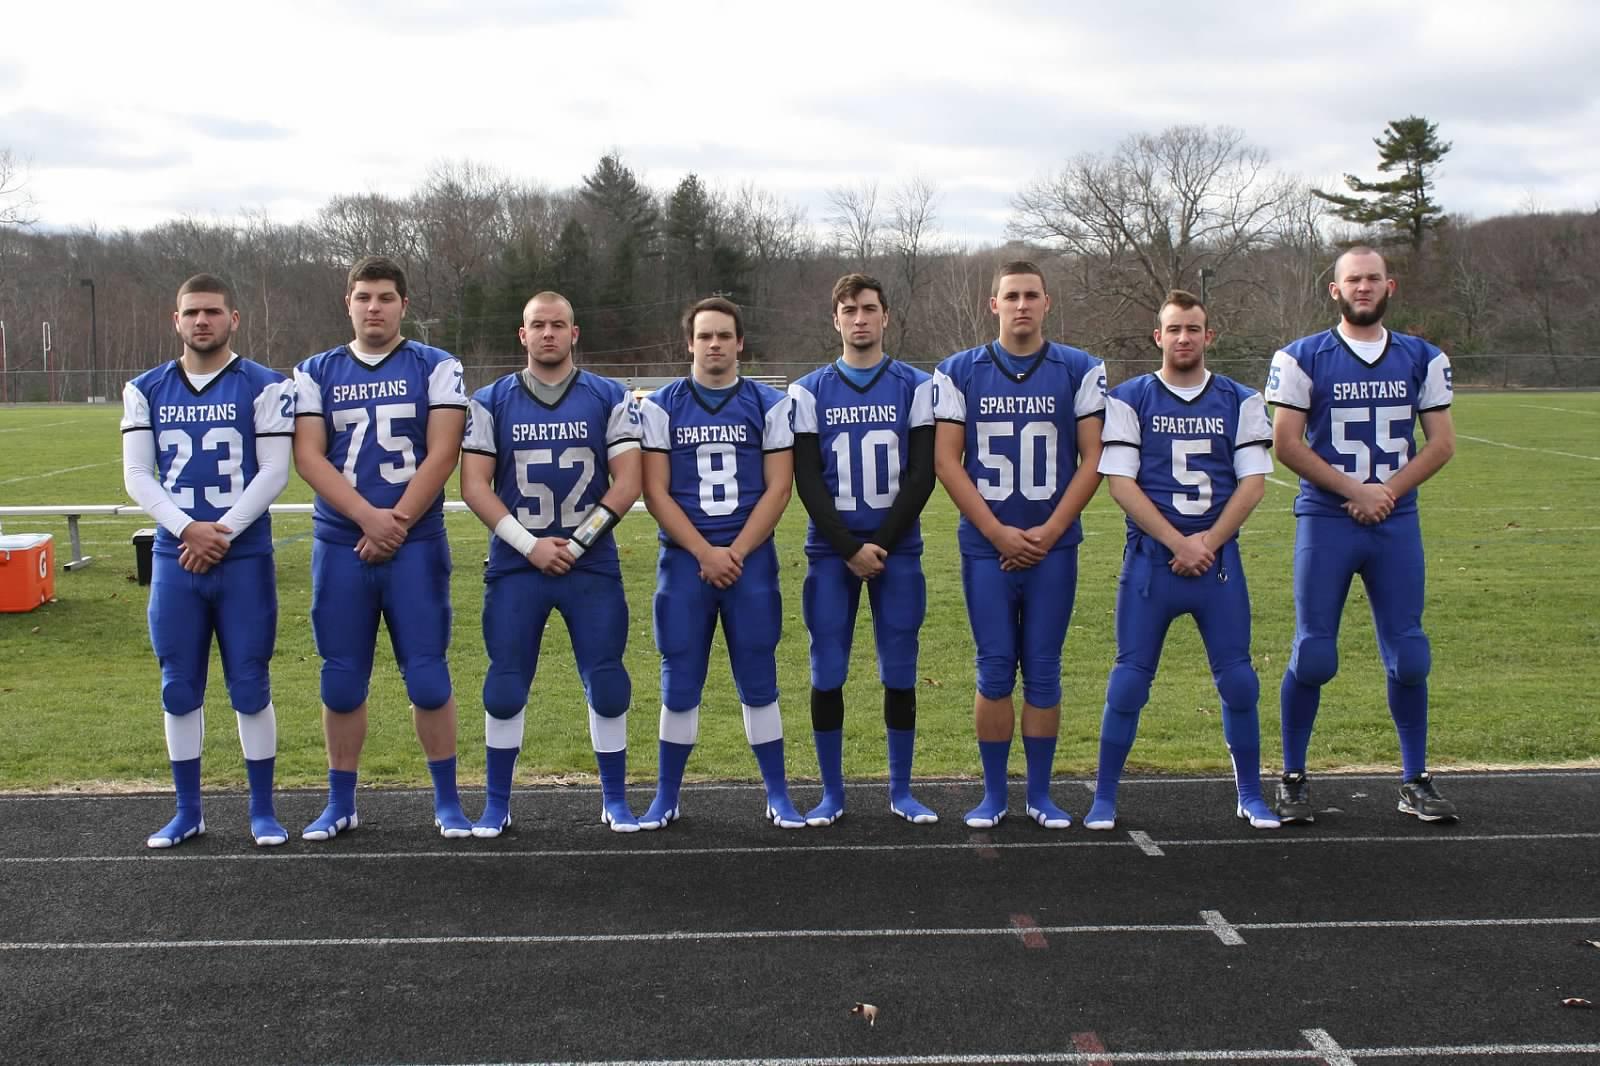 The seniors of Mills' varsity football team include Tyler Mello, Garrett LaPointe, Connor Kennedy, Lucas Lanning, Matt Rinkus, Adam Positano, Collin Kennedy and Sean Burke.